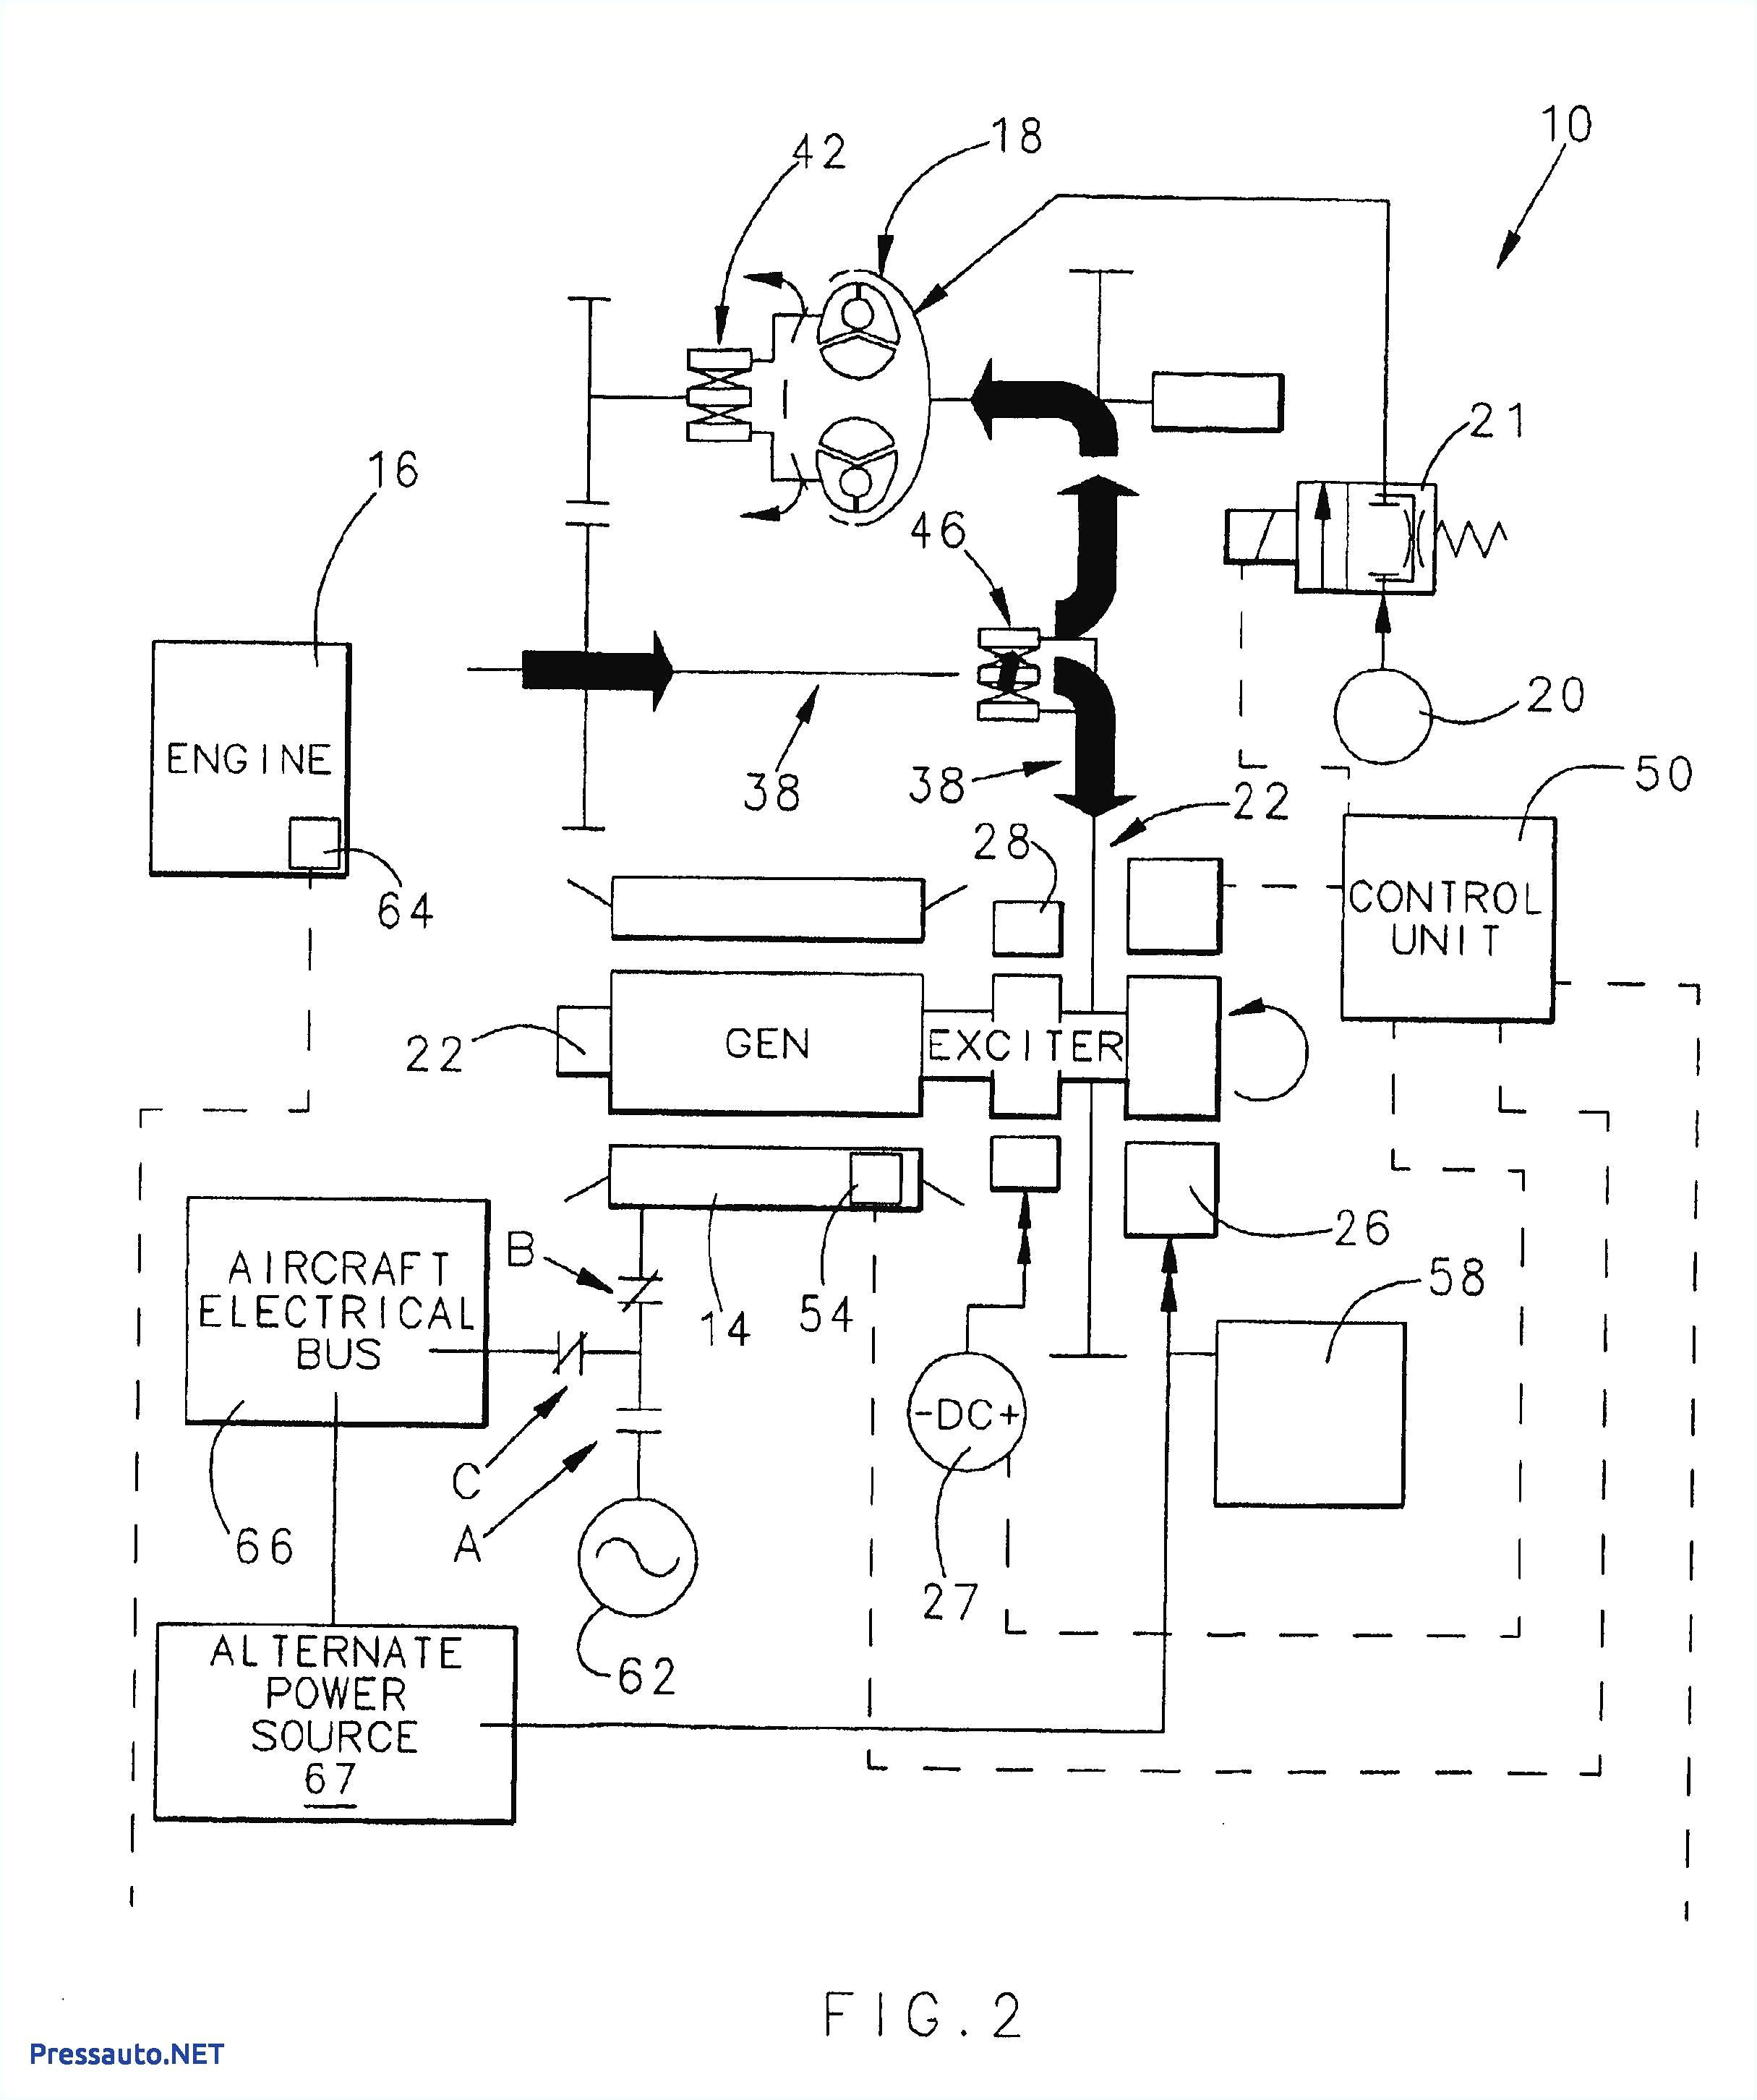 gm 10si cs130 alternator wiring diagram gm headlight wiring harness cs130d alternator wiring gm cs130 alternator